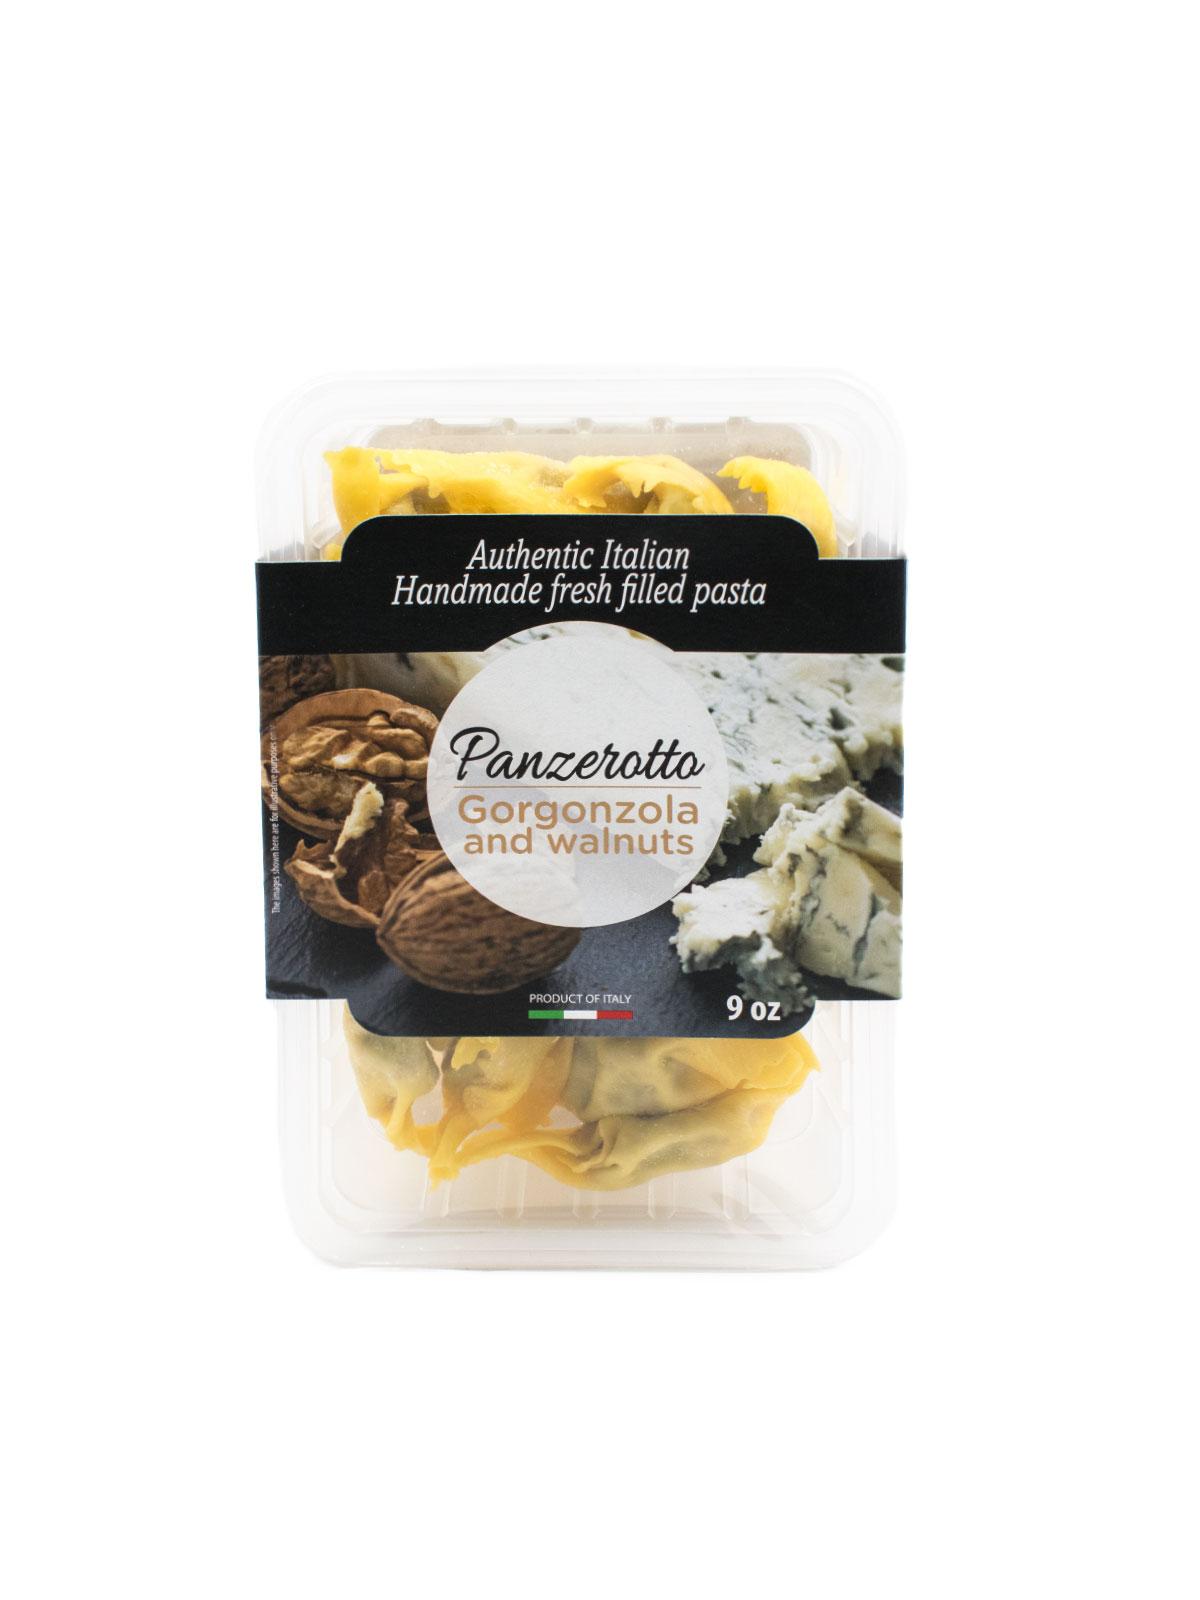 Fresh Ravioli with Gorgonzola and Walnuts - Pastas, Rice, and Grains - Buon'Italia